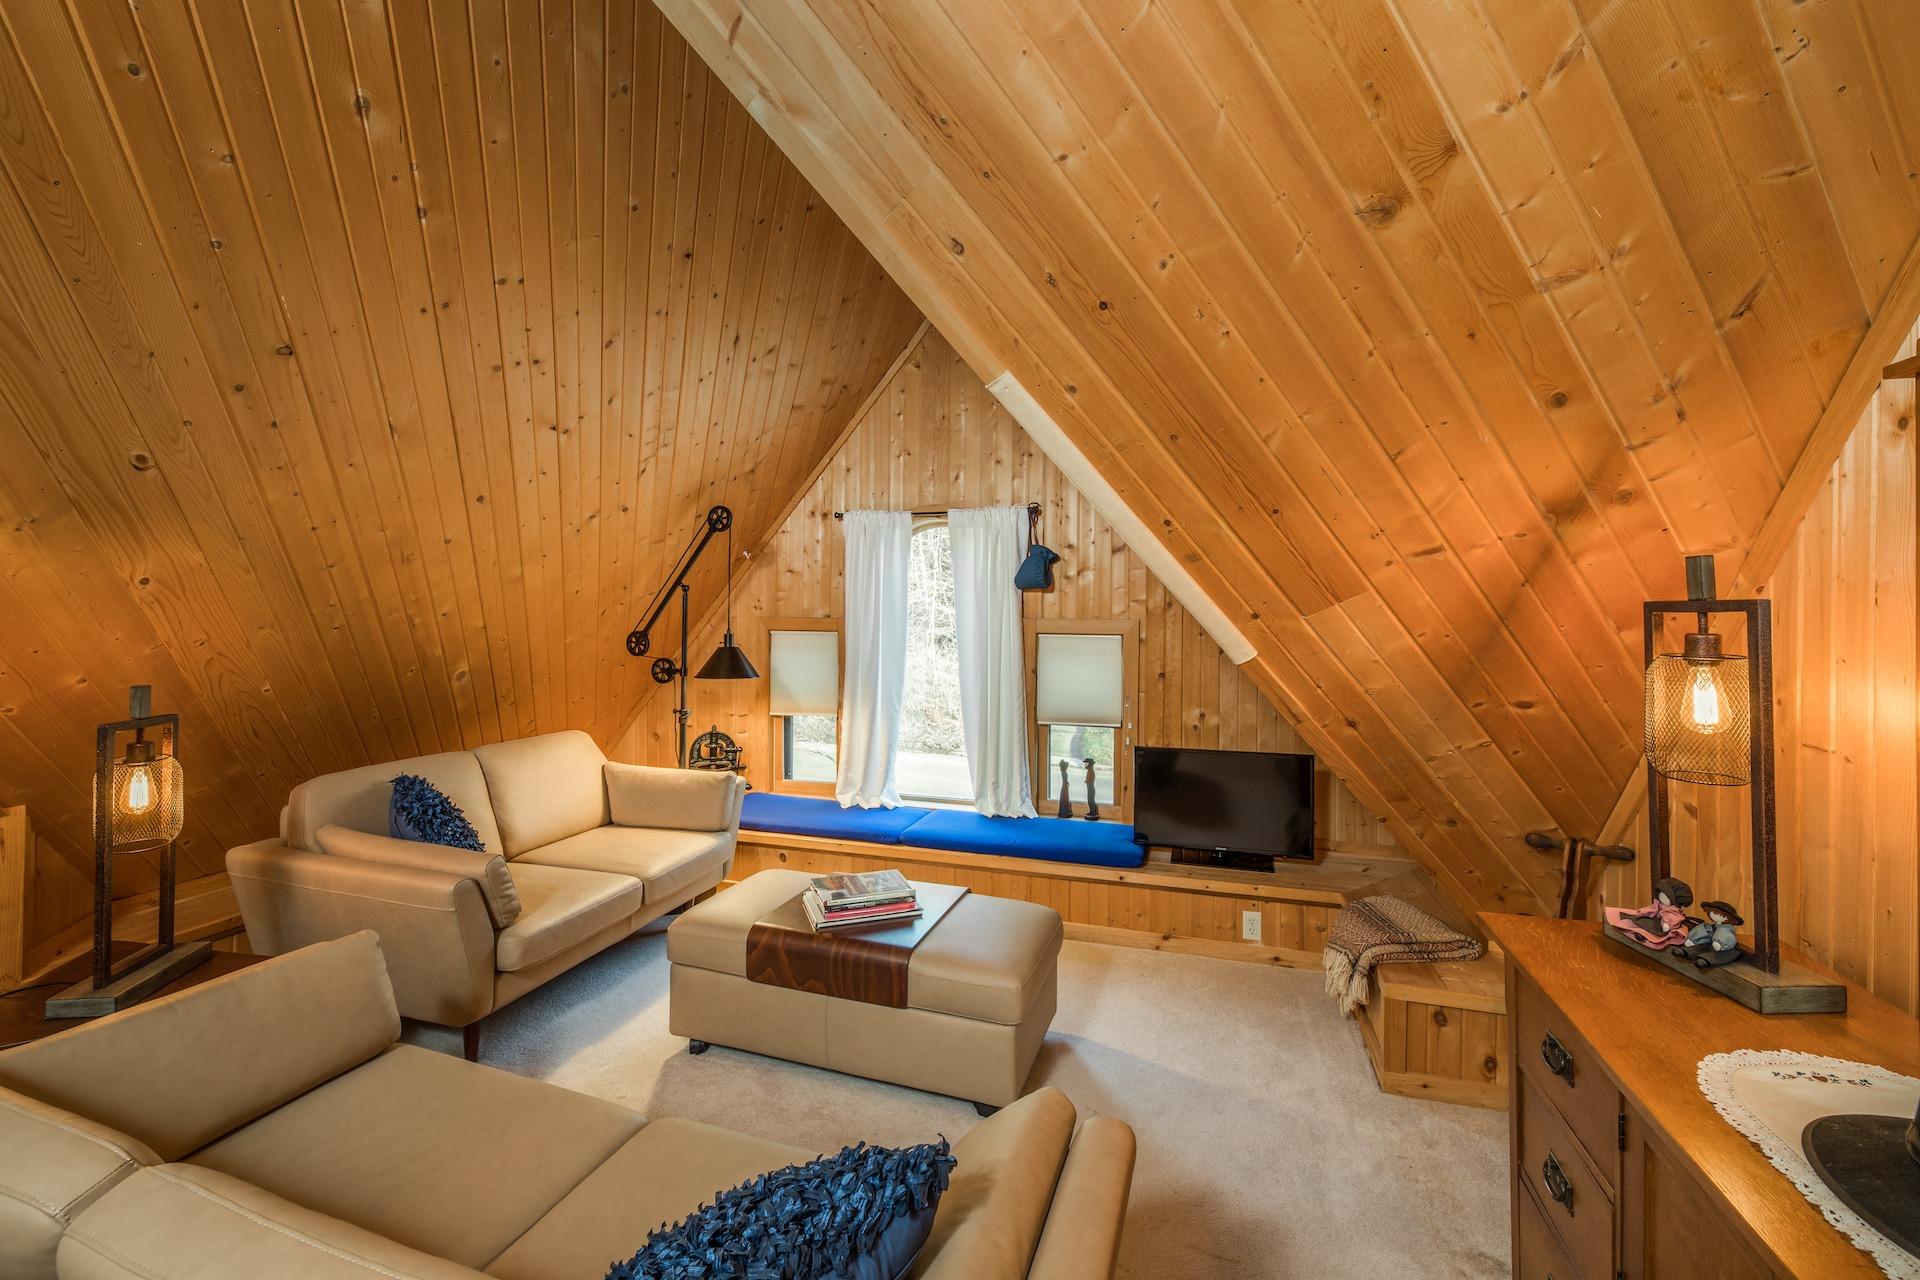 Habberstad-amish - Habberstad House Bed and Breakfast